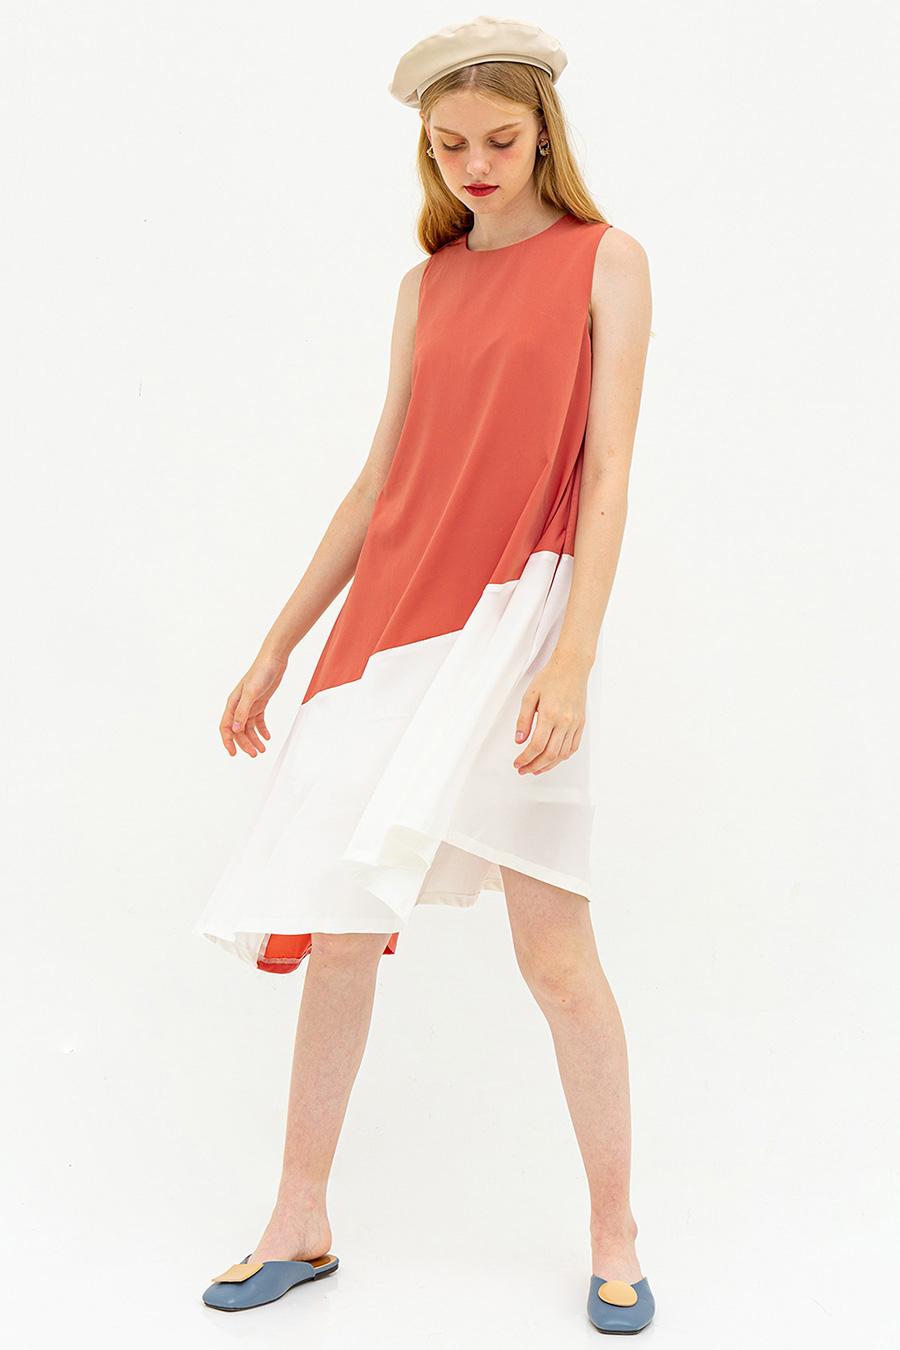 FIUGGI DRESS - ROSE DAWN [BY MODPARADE]